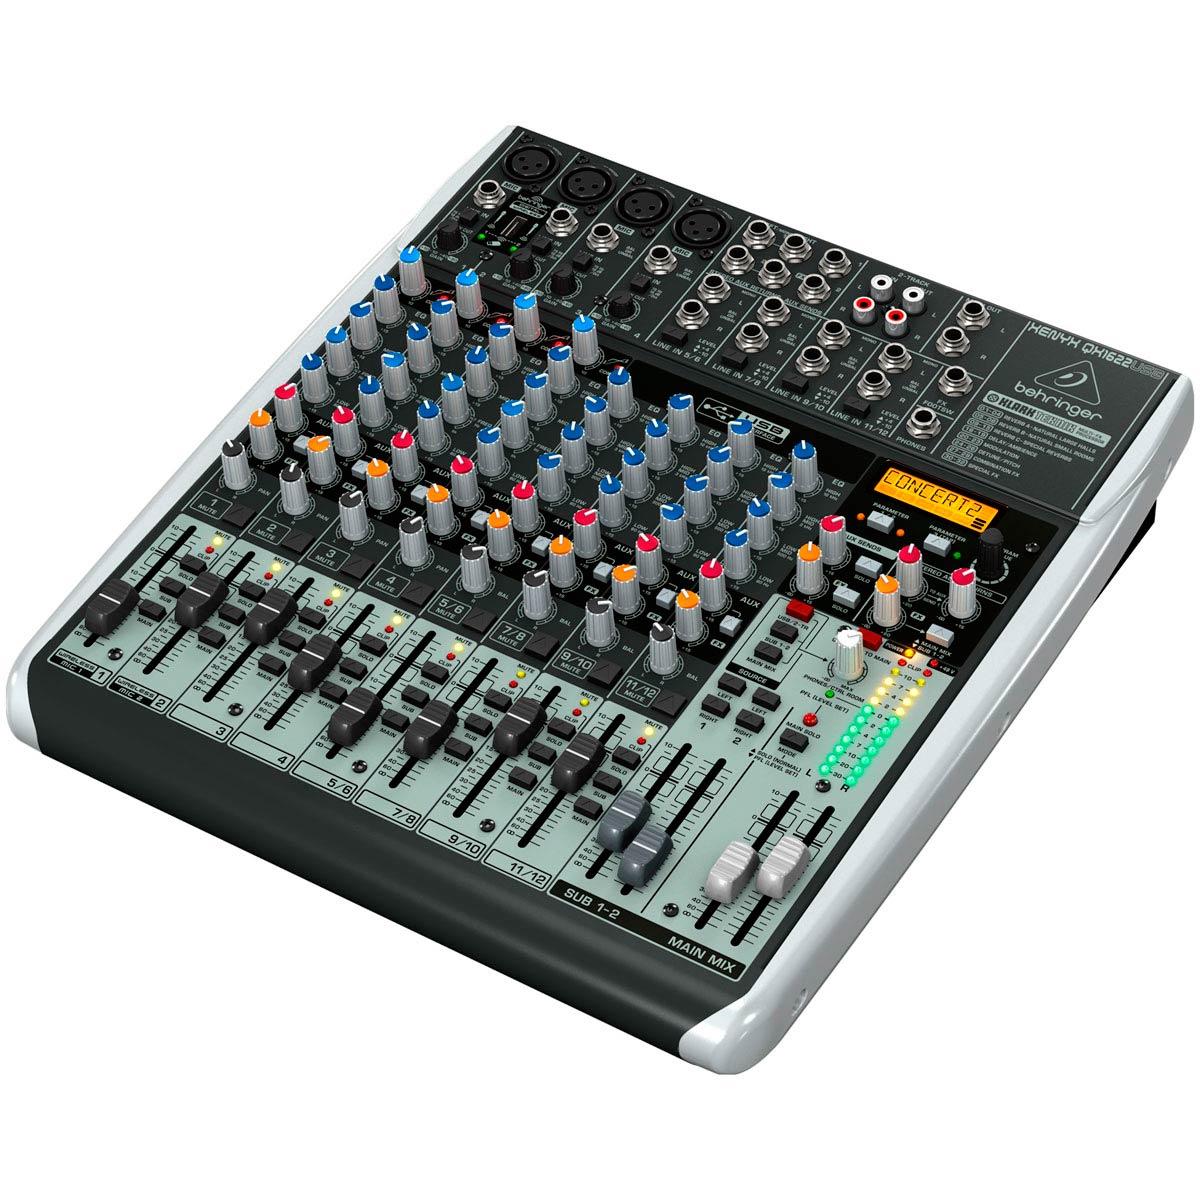 Mesa de Som 16 Canais Balanceados (4 XLR + 12 P10) c/ USB / Efeito / Phantom / 2 Auxiliares - Xenyx QX 1622 USB Behringer